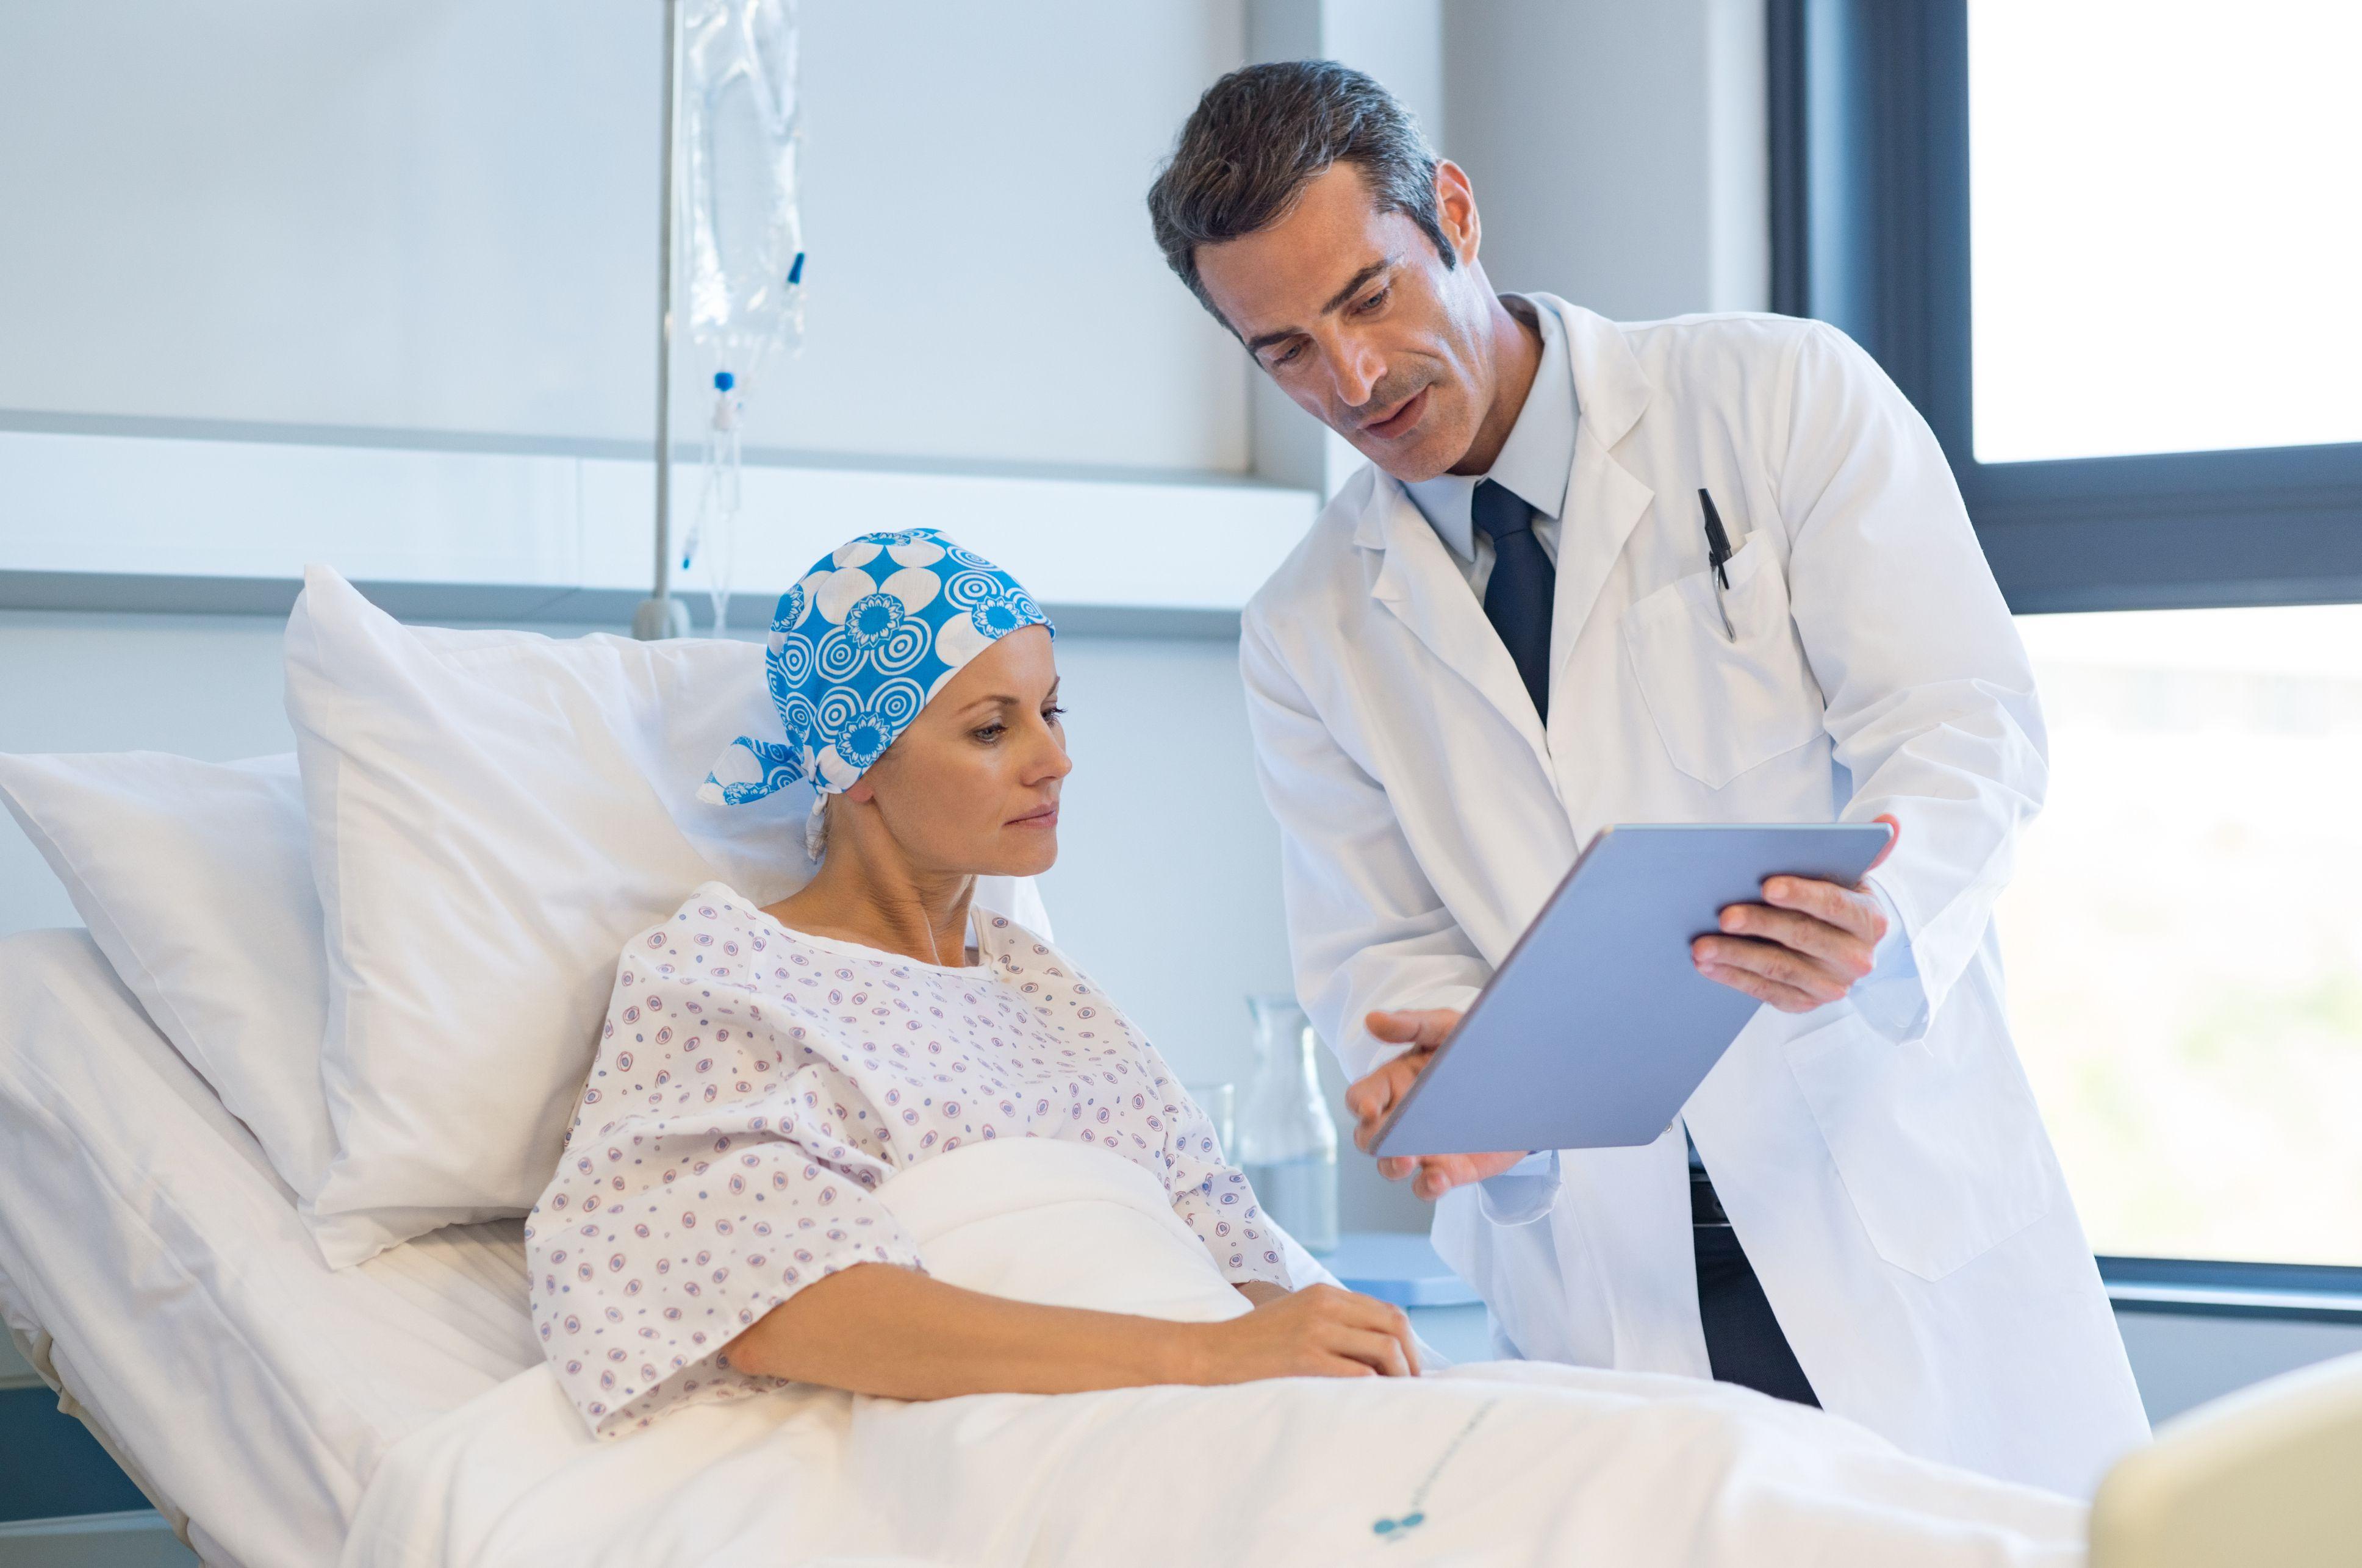 Profilul de risc clinic asociat cancerului ovarian Peritoneal cancer after hysterectomy